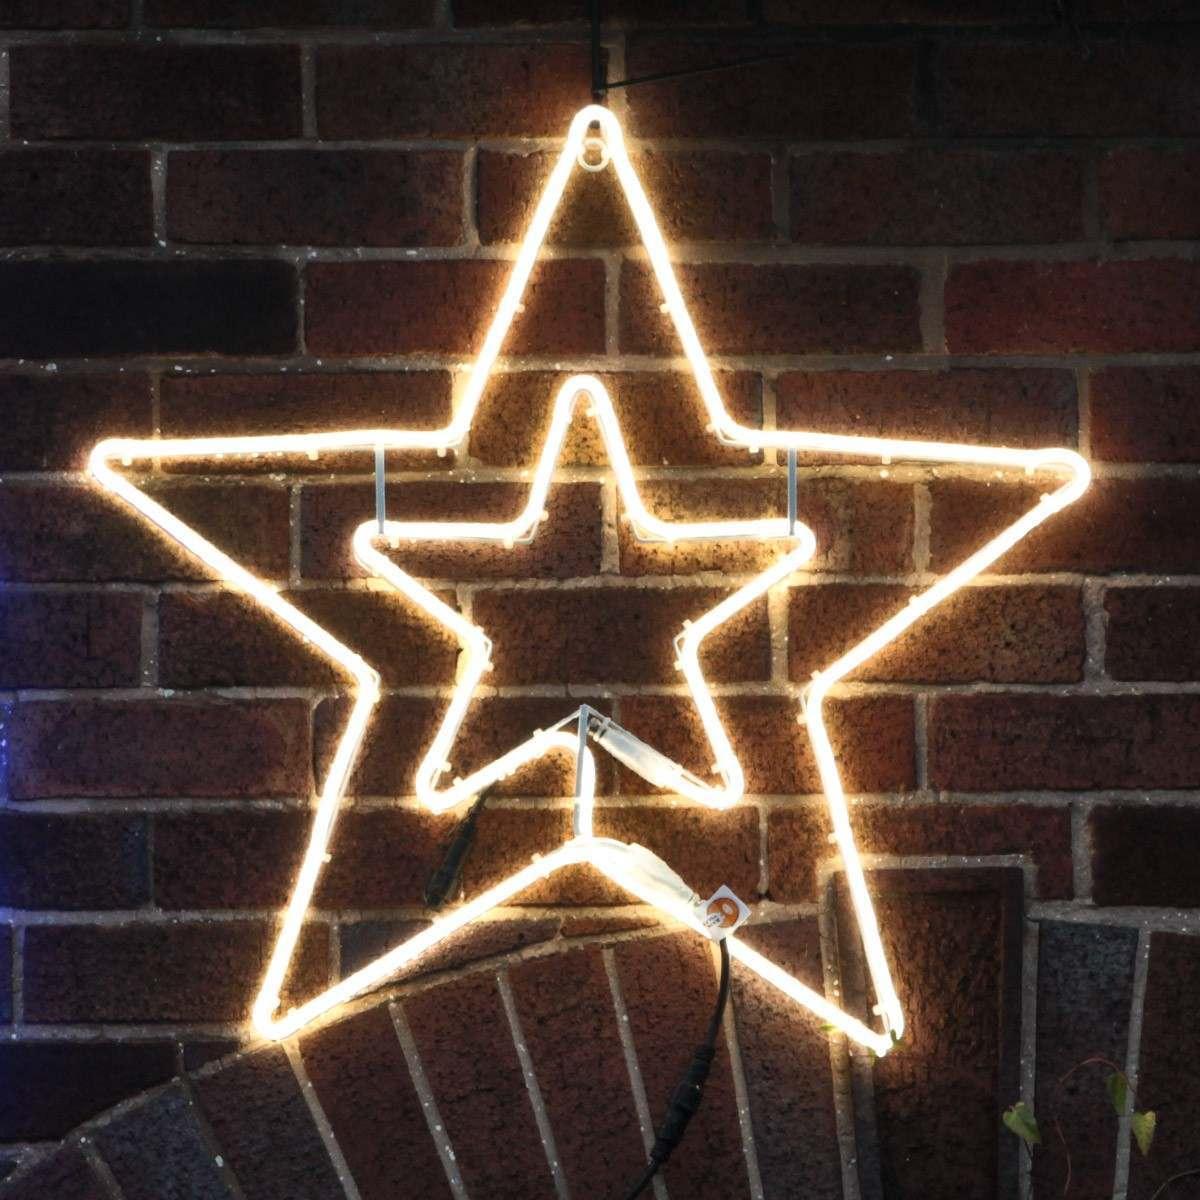 75cm White Neon Flex Double Star Silhouette, 240 LEDs